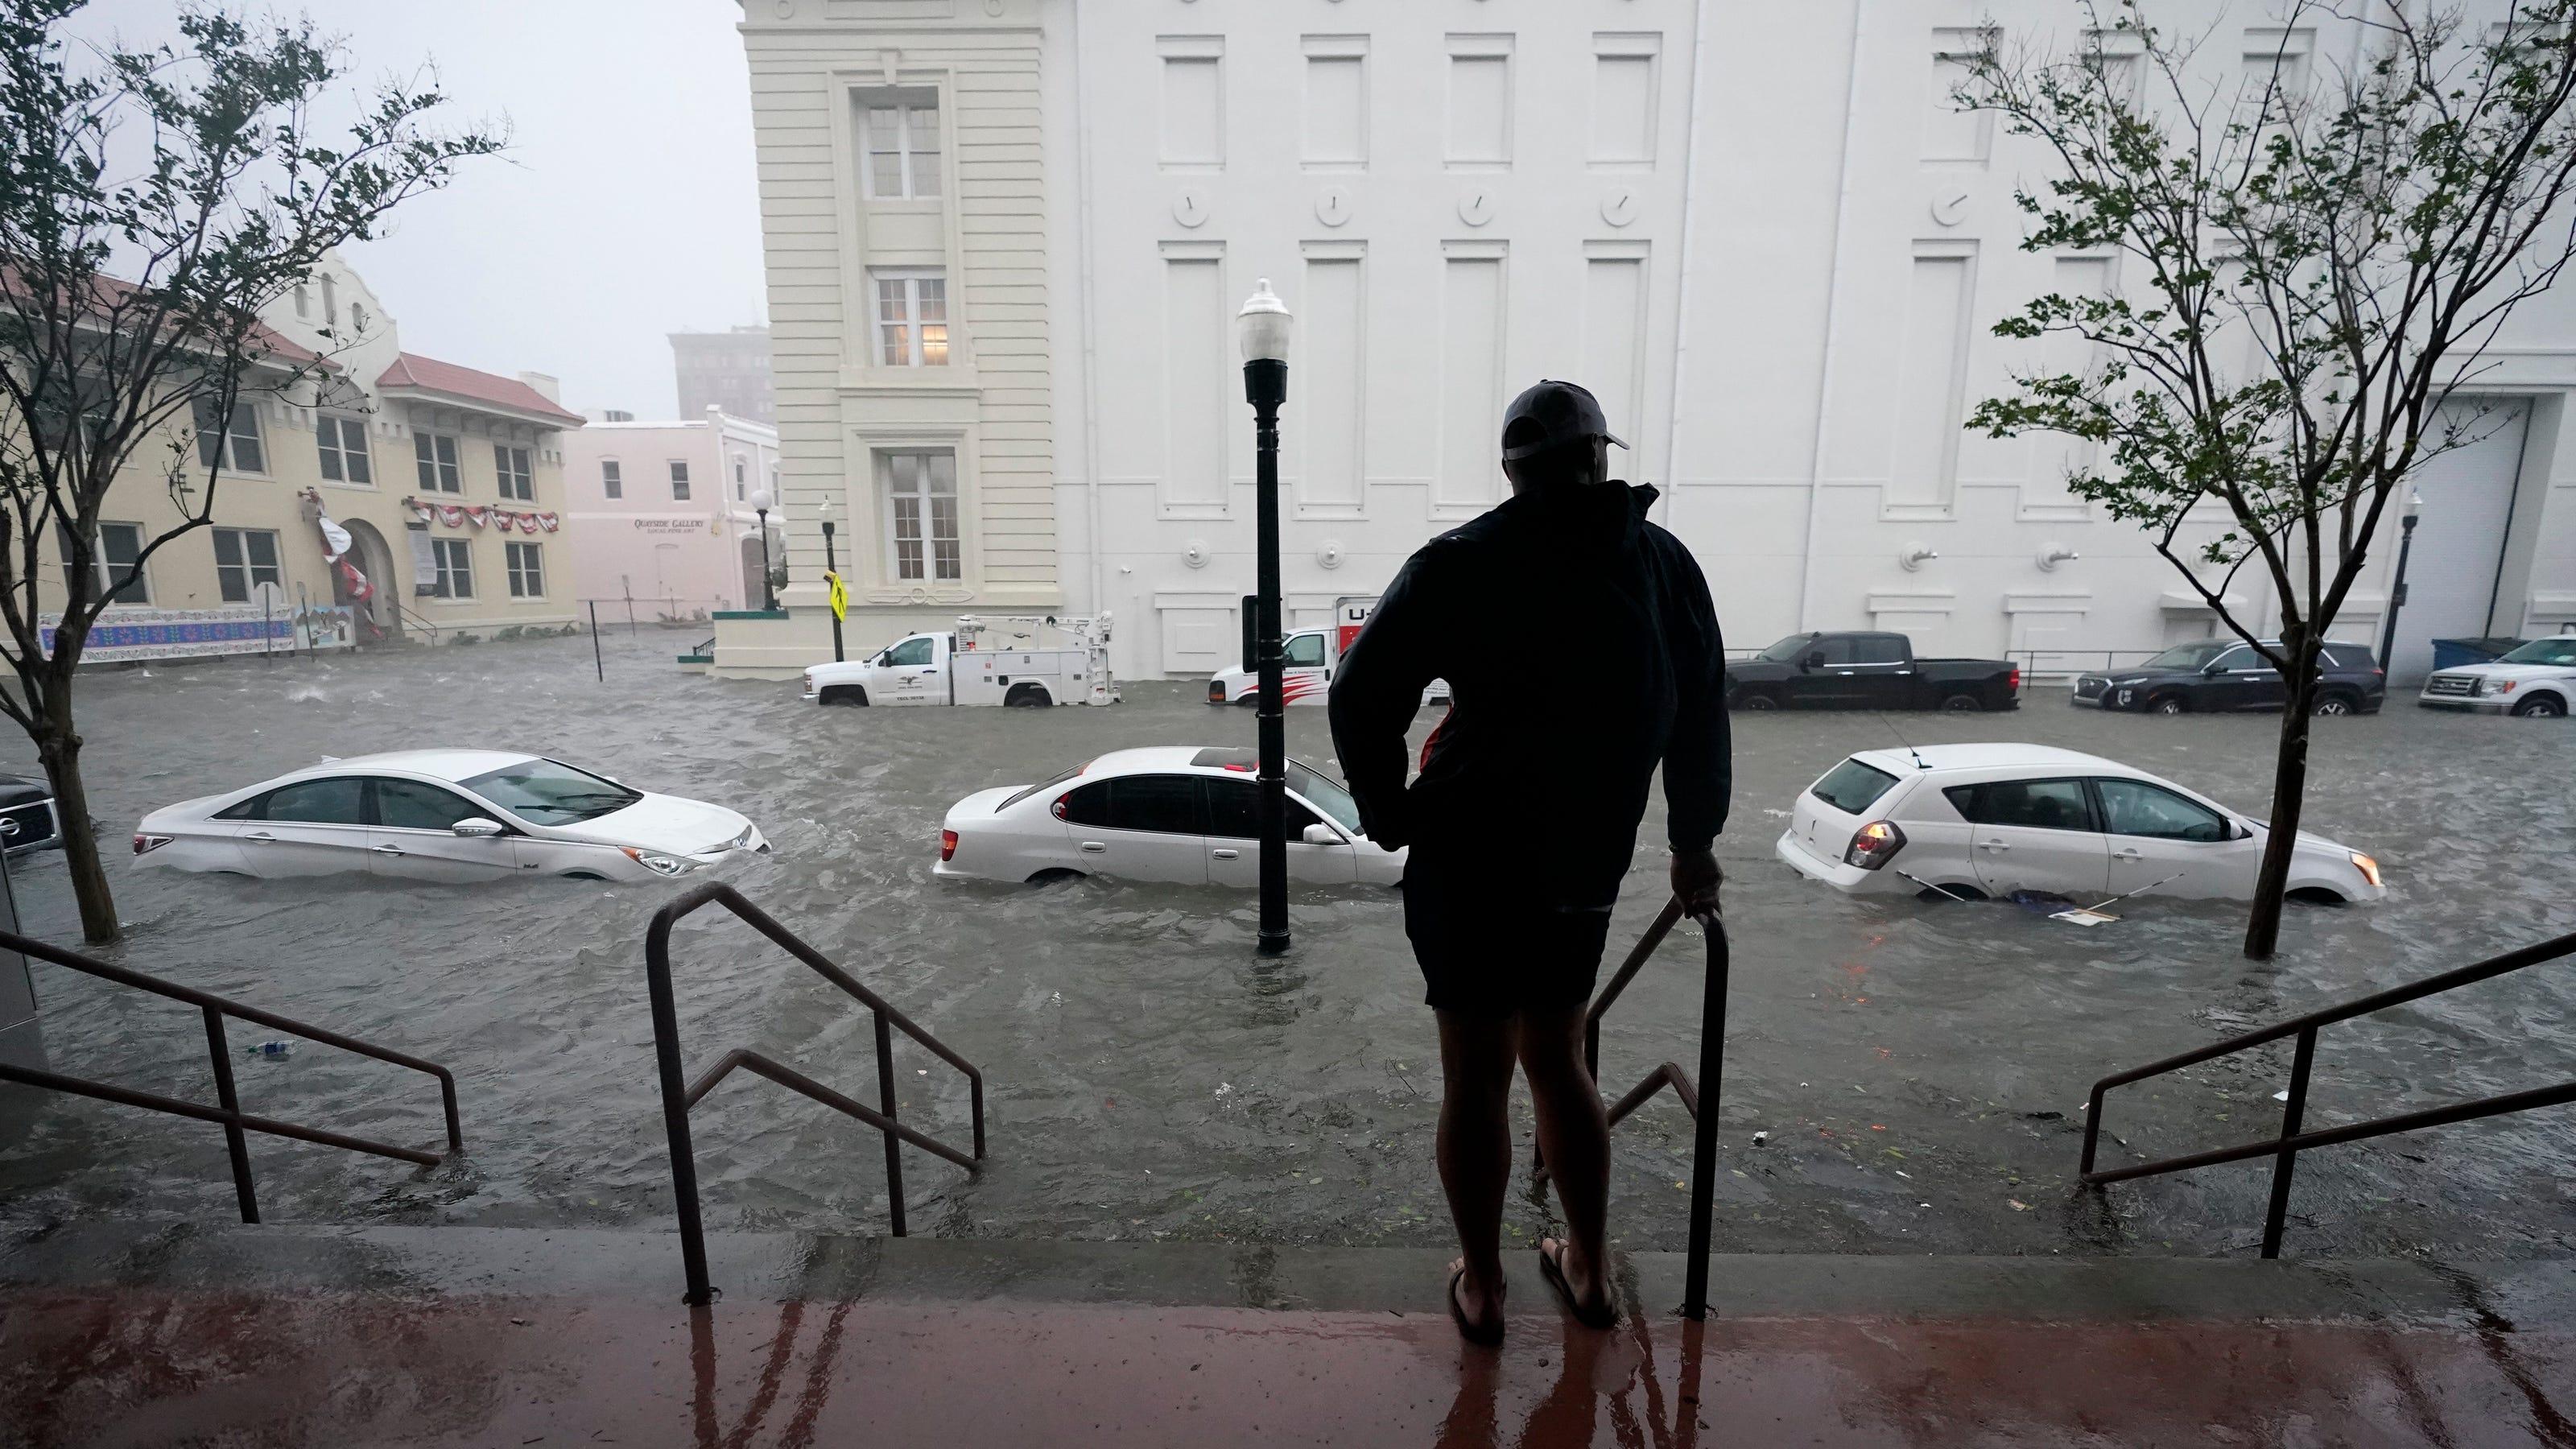 Hurricane Sally tracker, damage: Landfall in Gulf Shores ... Hurricane Sally Tracker Today